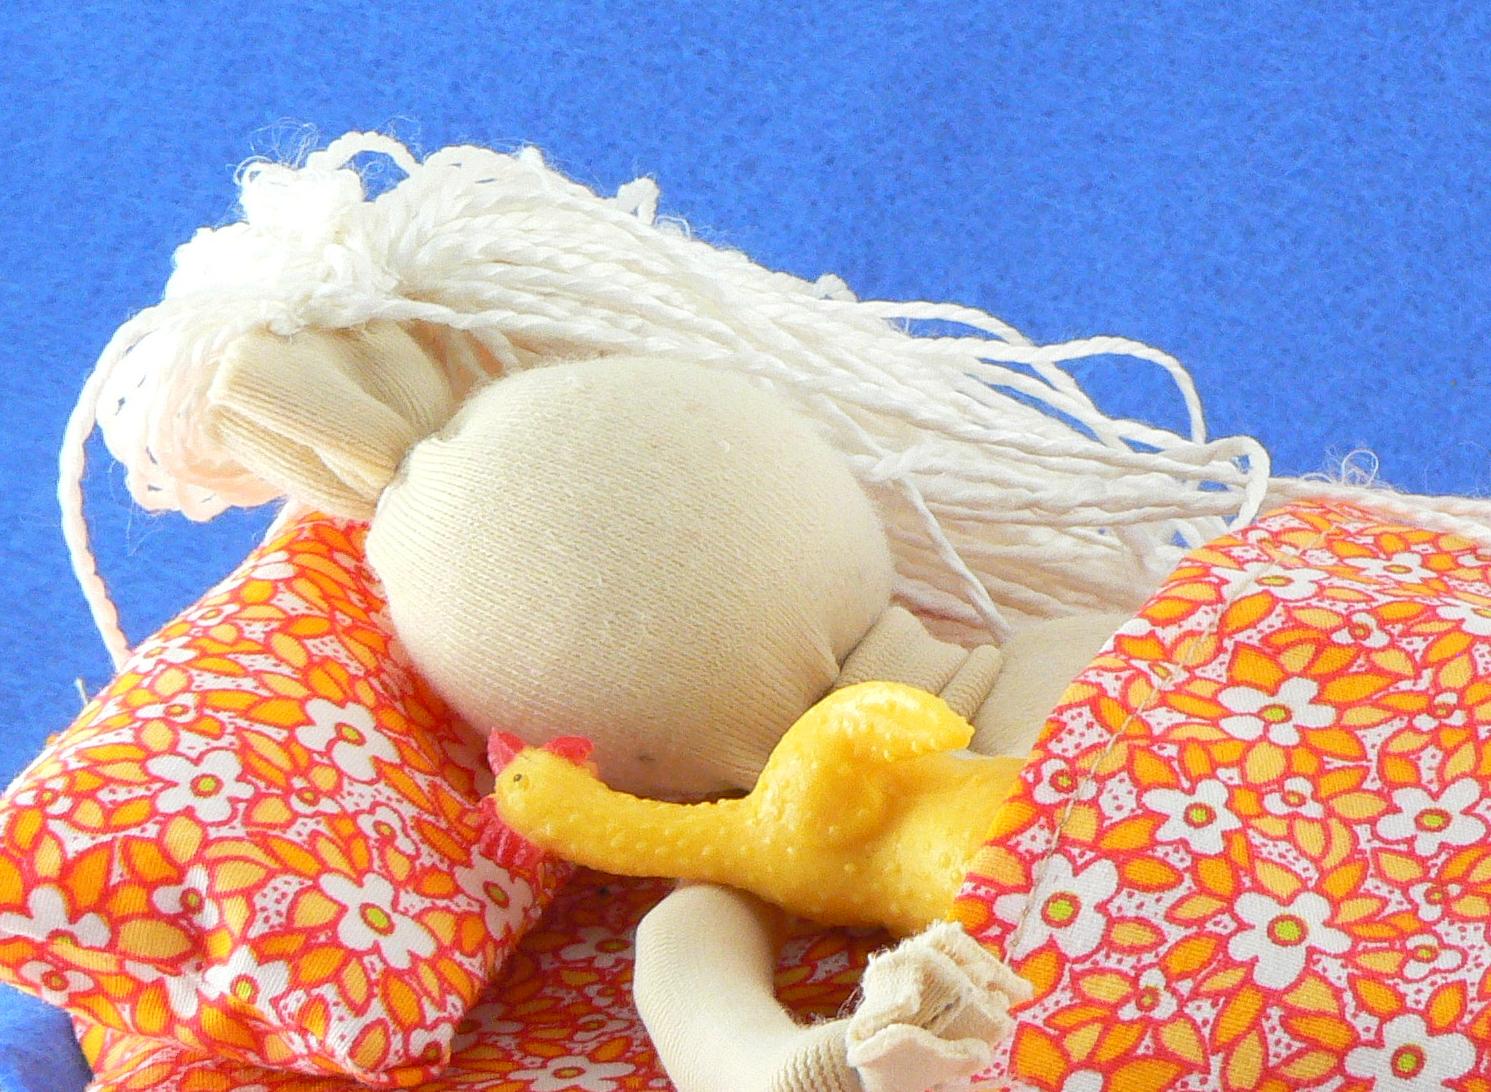 chicken-in-the-bed.JPG